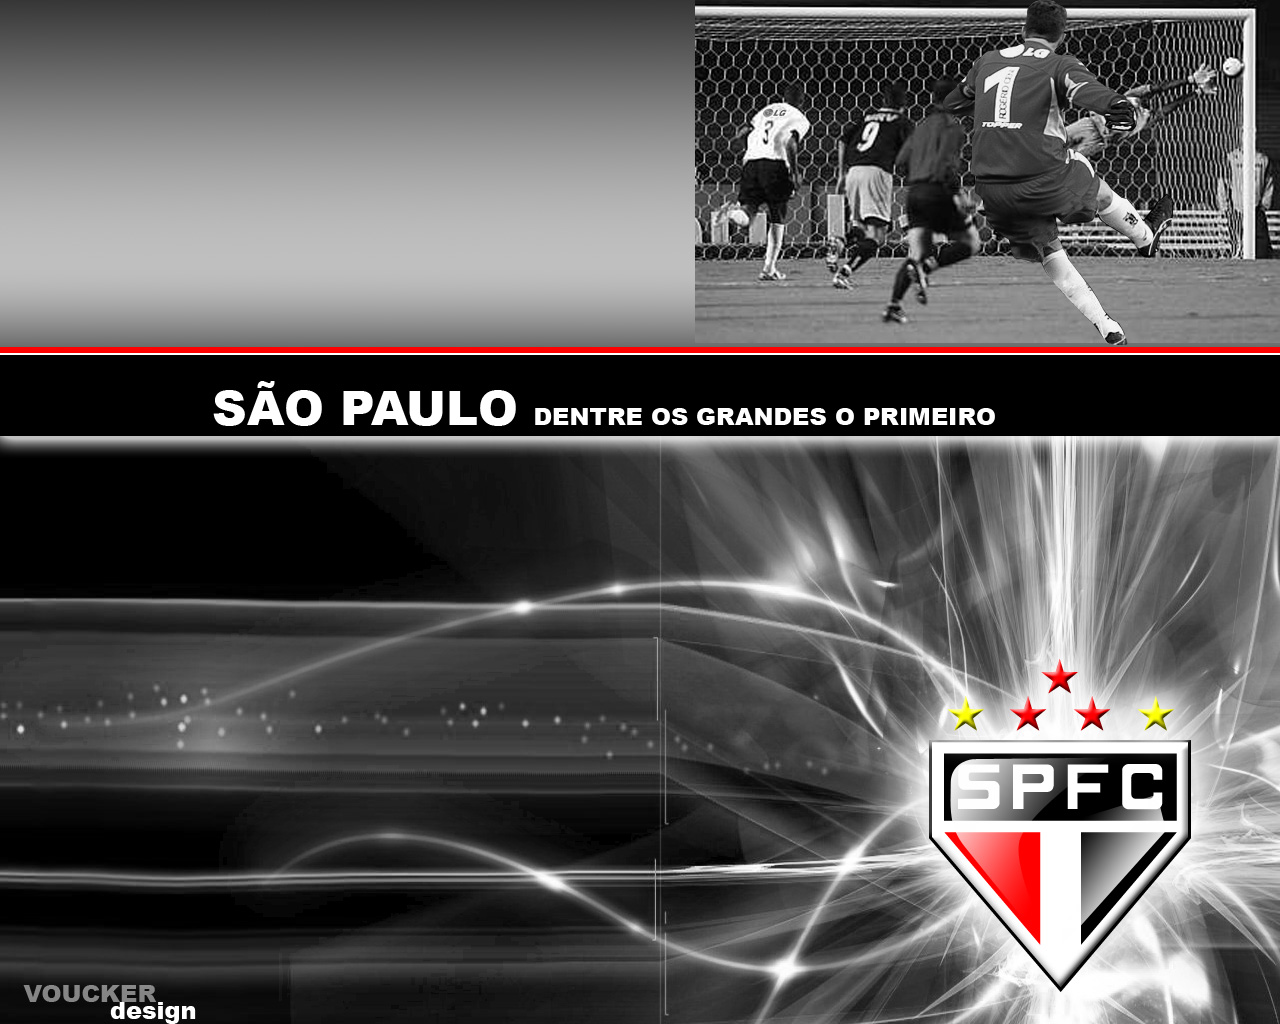 http://1.bp.blogspot.com/-en5z-lb1VJw/TixFevs25GI/AAAAAAAABqk/mx73IjWwX_k/s1600/Sao-Paulo-FC-Wallpaper-2011-5.jpg